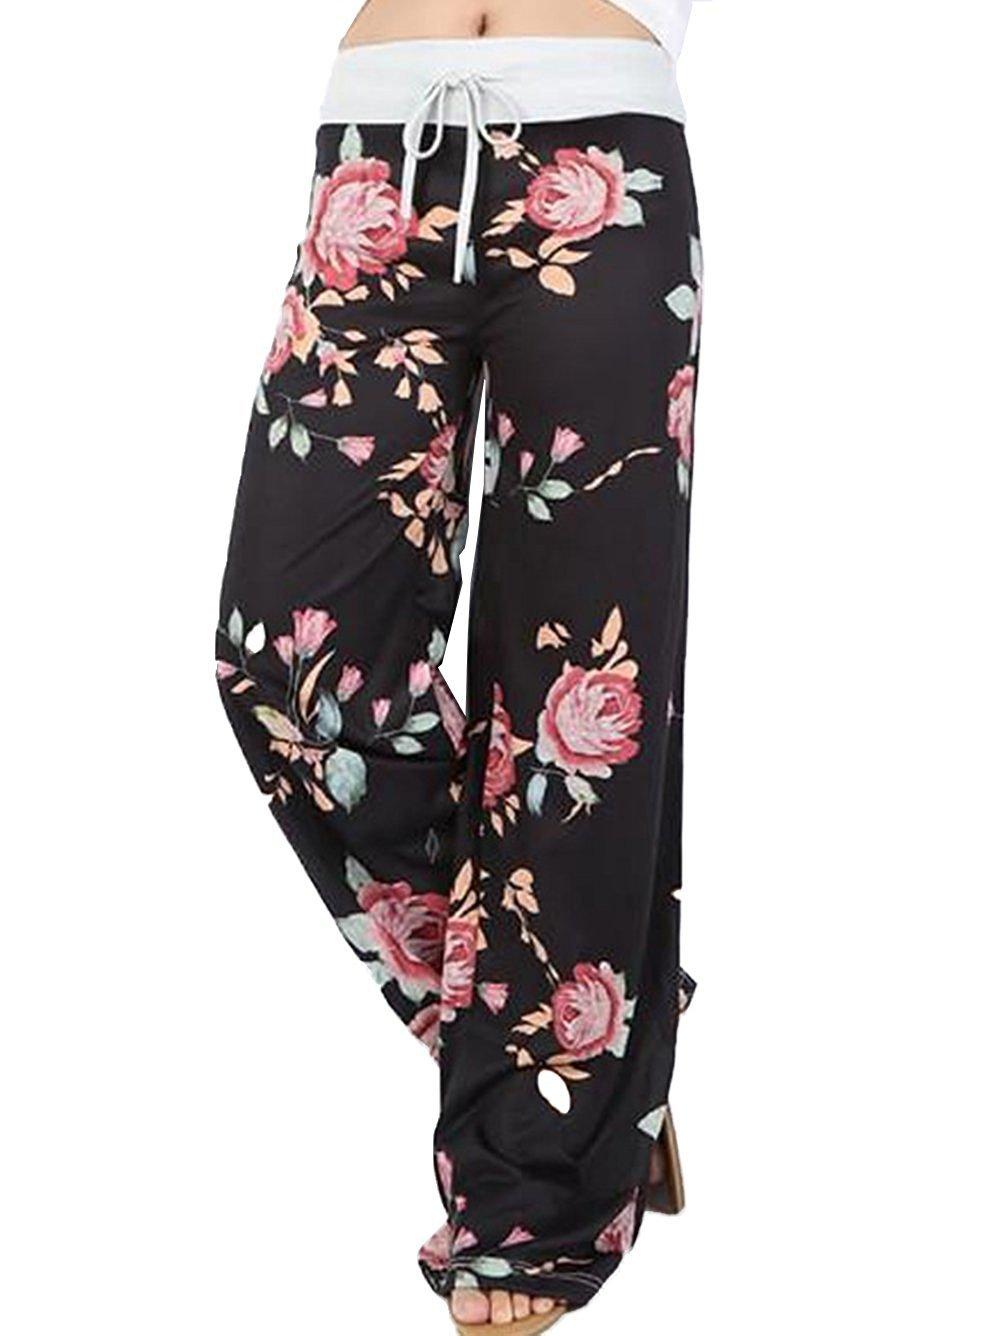 US-straight Women's Floral Print Comfy Stretch Drawstring Palazzo Wide Leg Lounge Pants (L, 0447-black)